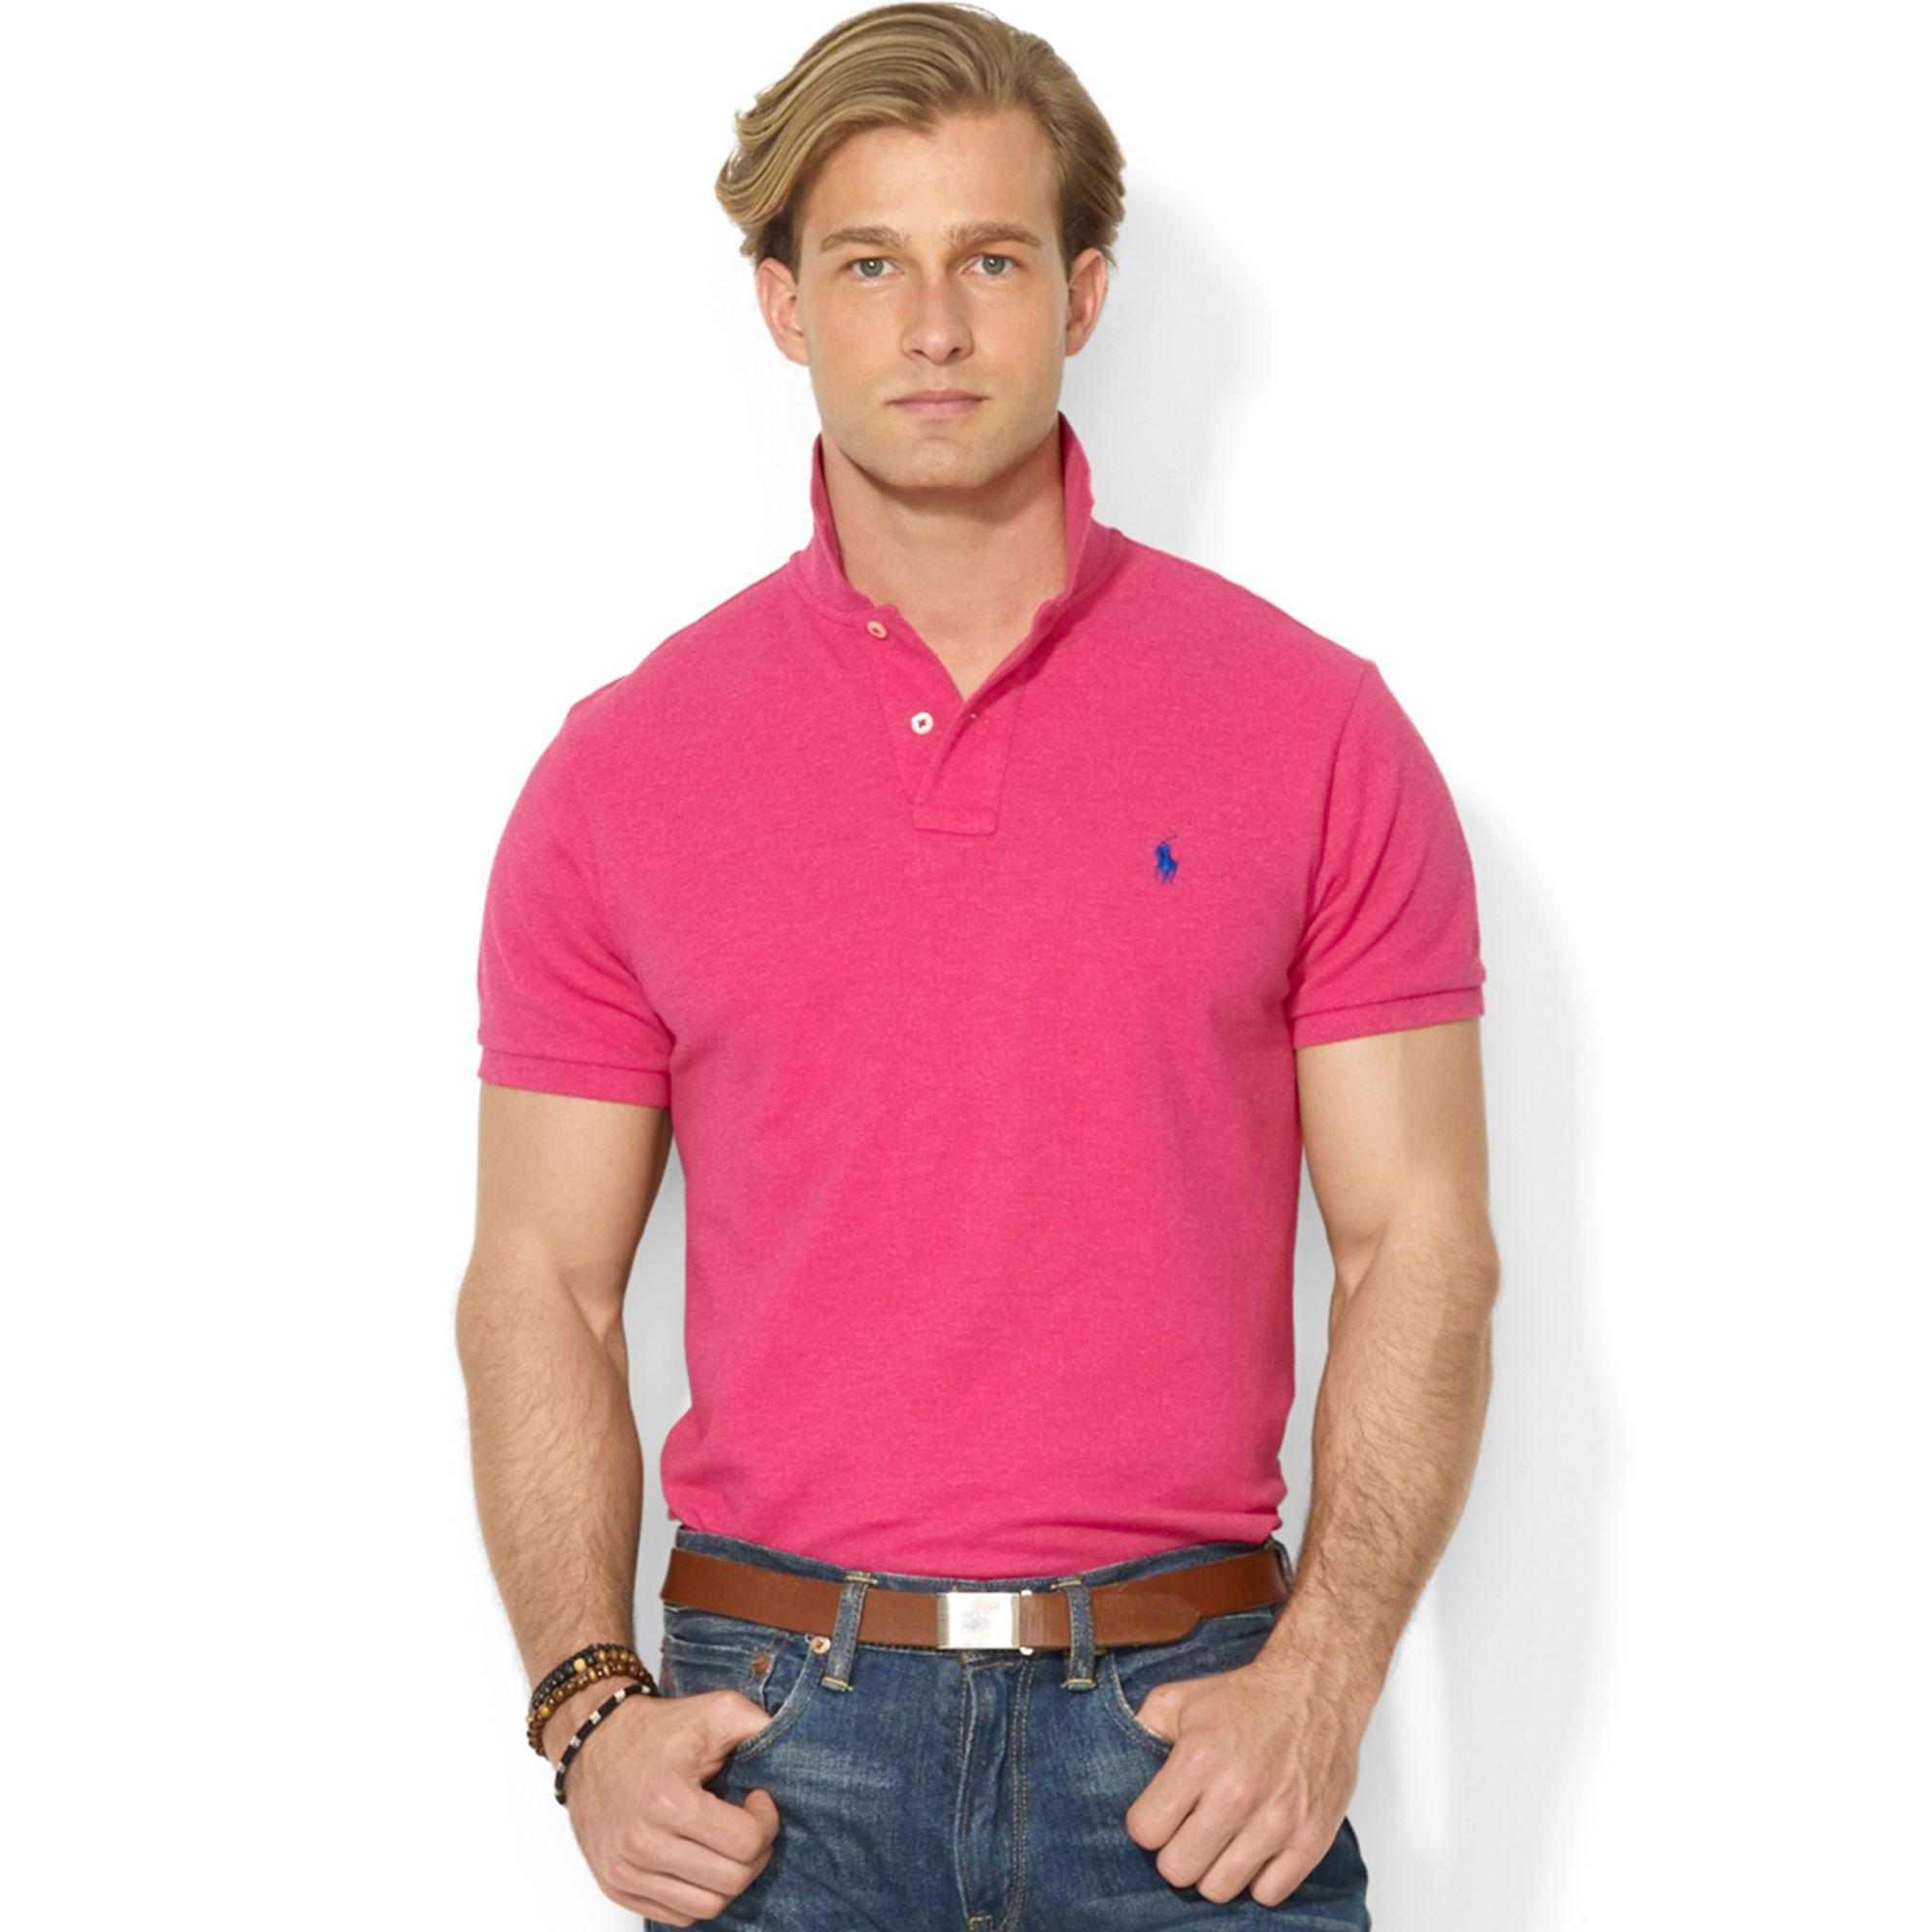 Polo ralph lauren custom fit mesh polo shirt in pink for for Polo ralph lauren custom fit polo shirt